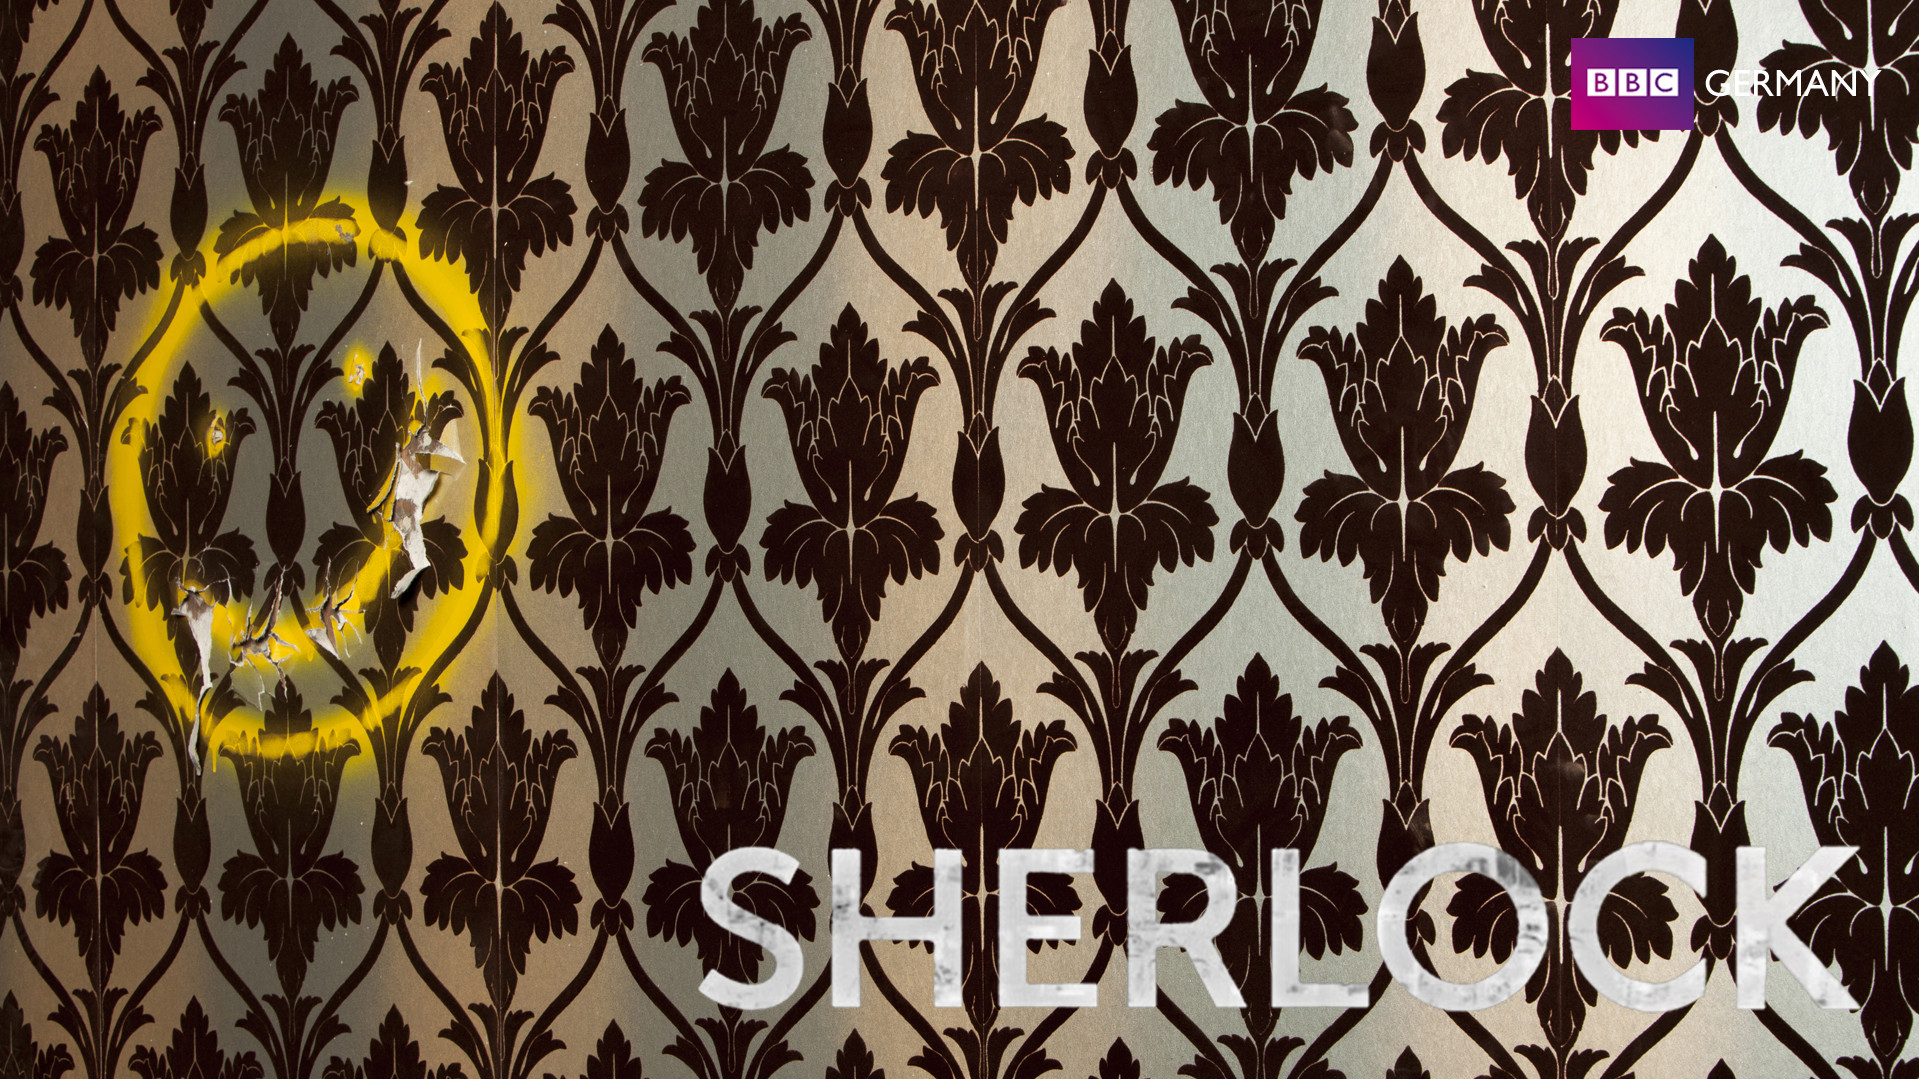 1920x1080 Sherlock Wallpaper 77 Wallpapers Quality Hd